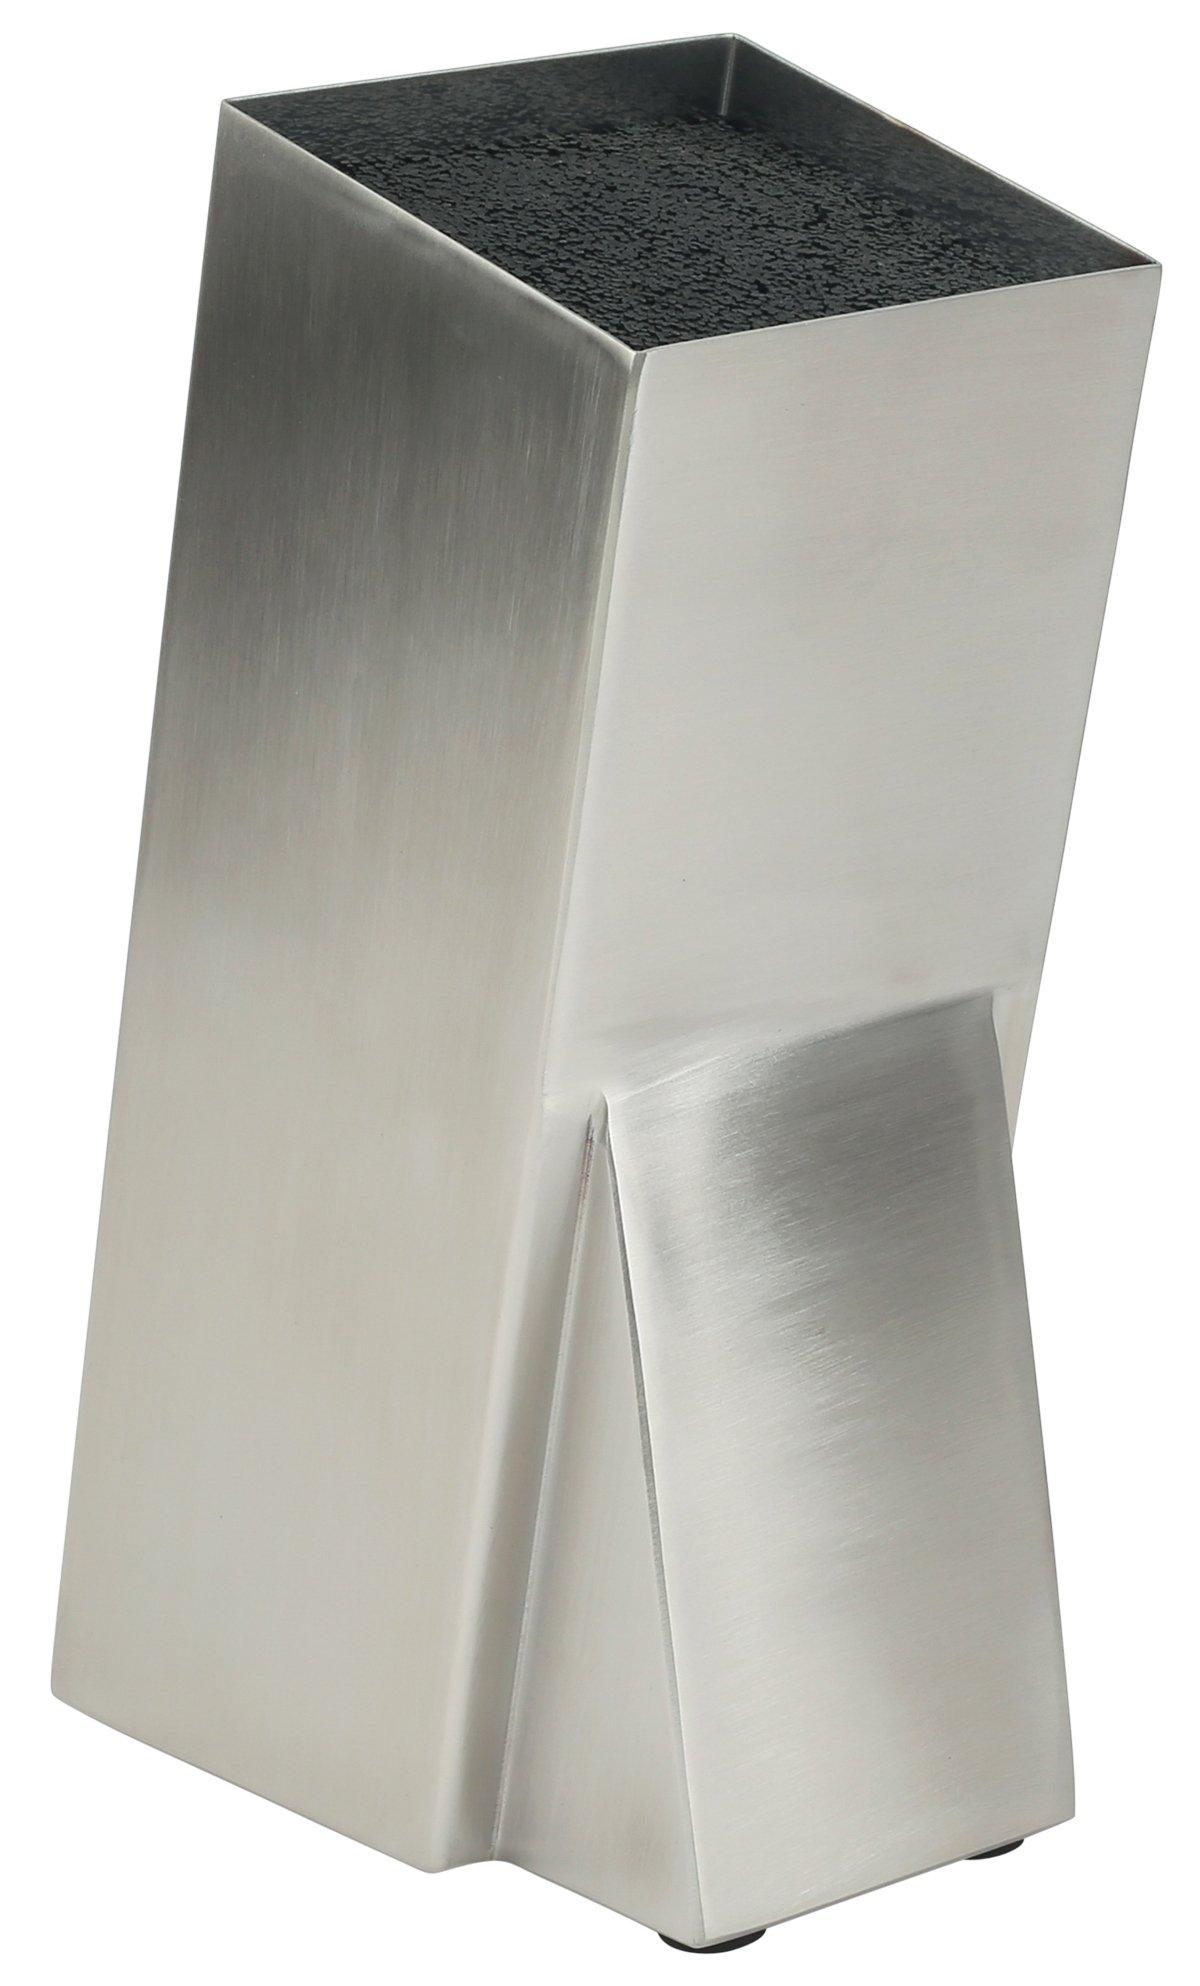 Mantello Universal Stainless Steel Knife Block Knife Holder Storage Organizer by Mantello